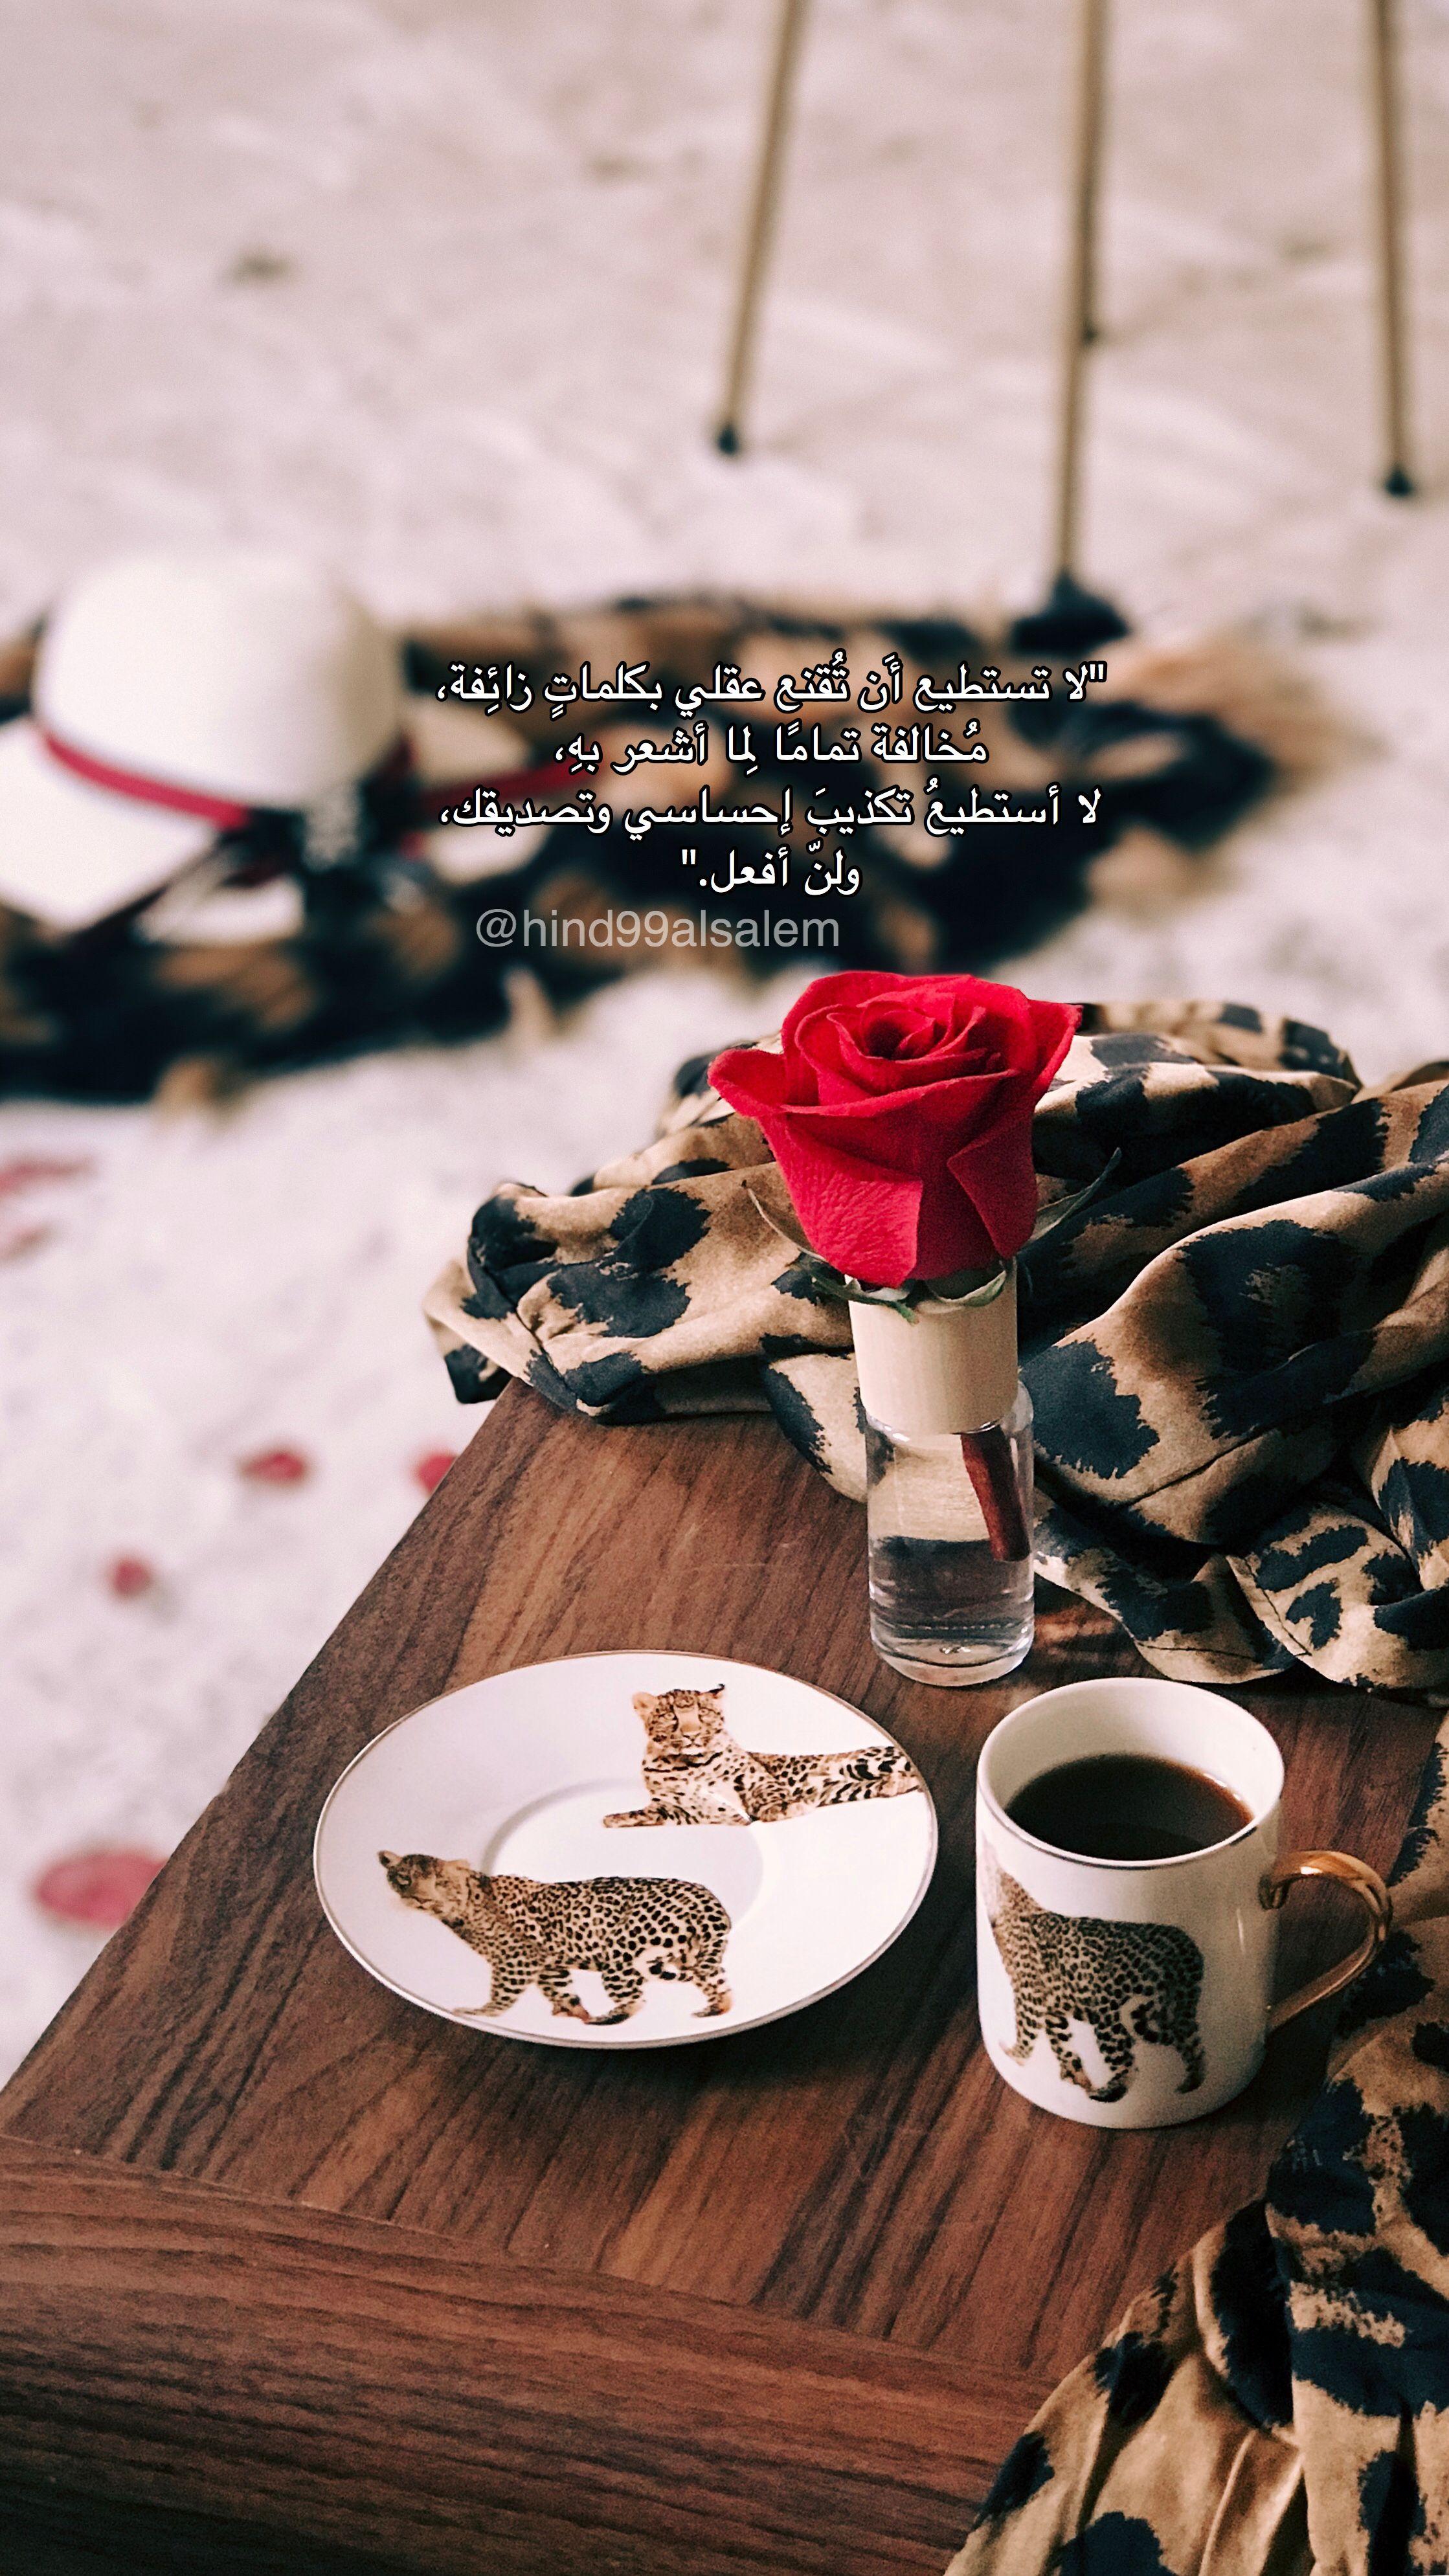 دعاء صورة افكار احترافيه Coffee Coffeetime قهوه كوفي تكوين عدسه سناب Pictures كلام كلمات حب Live Lokai Bracelet Lokai Bracelet Picture Quotes